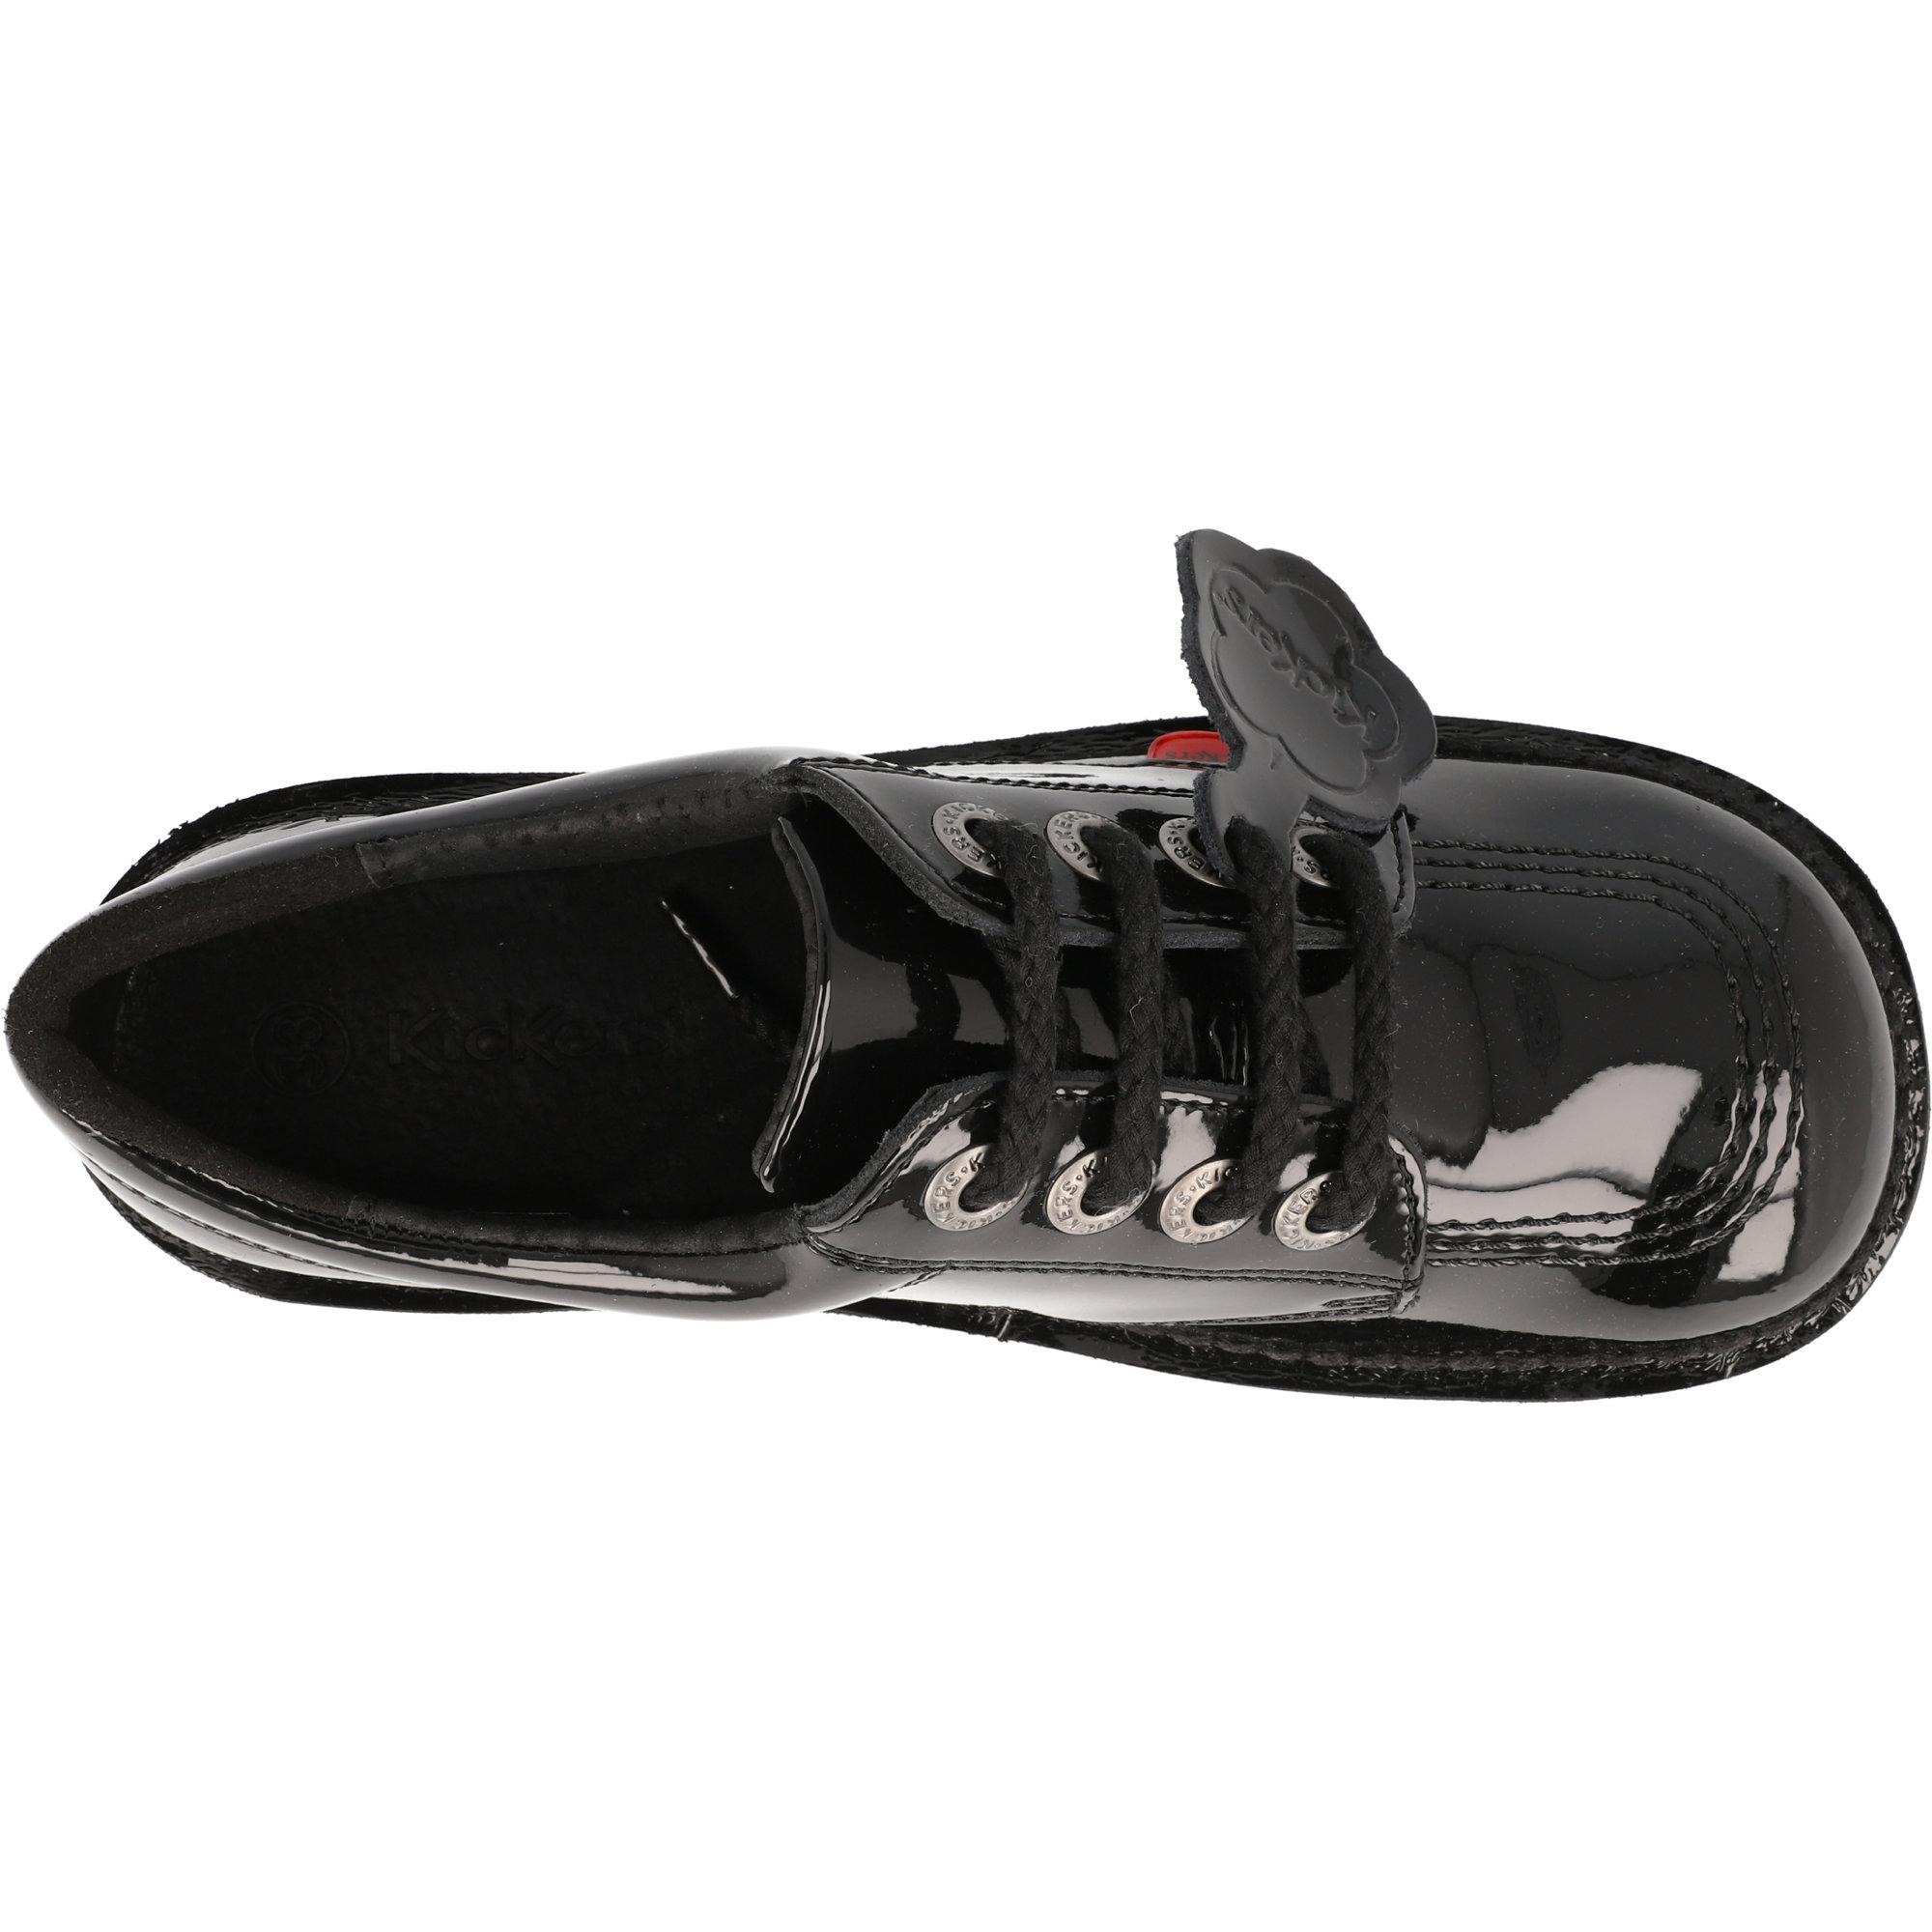 Kickers Kick Lo J Black Patent